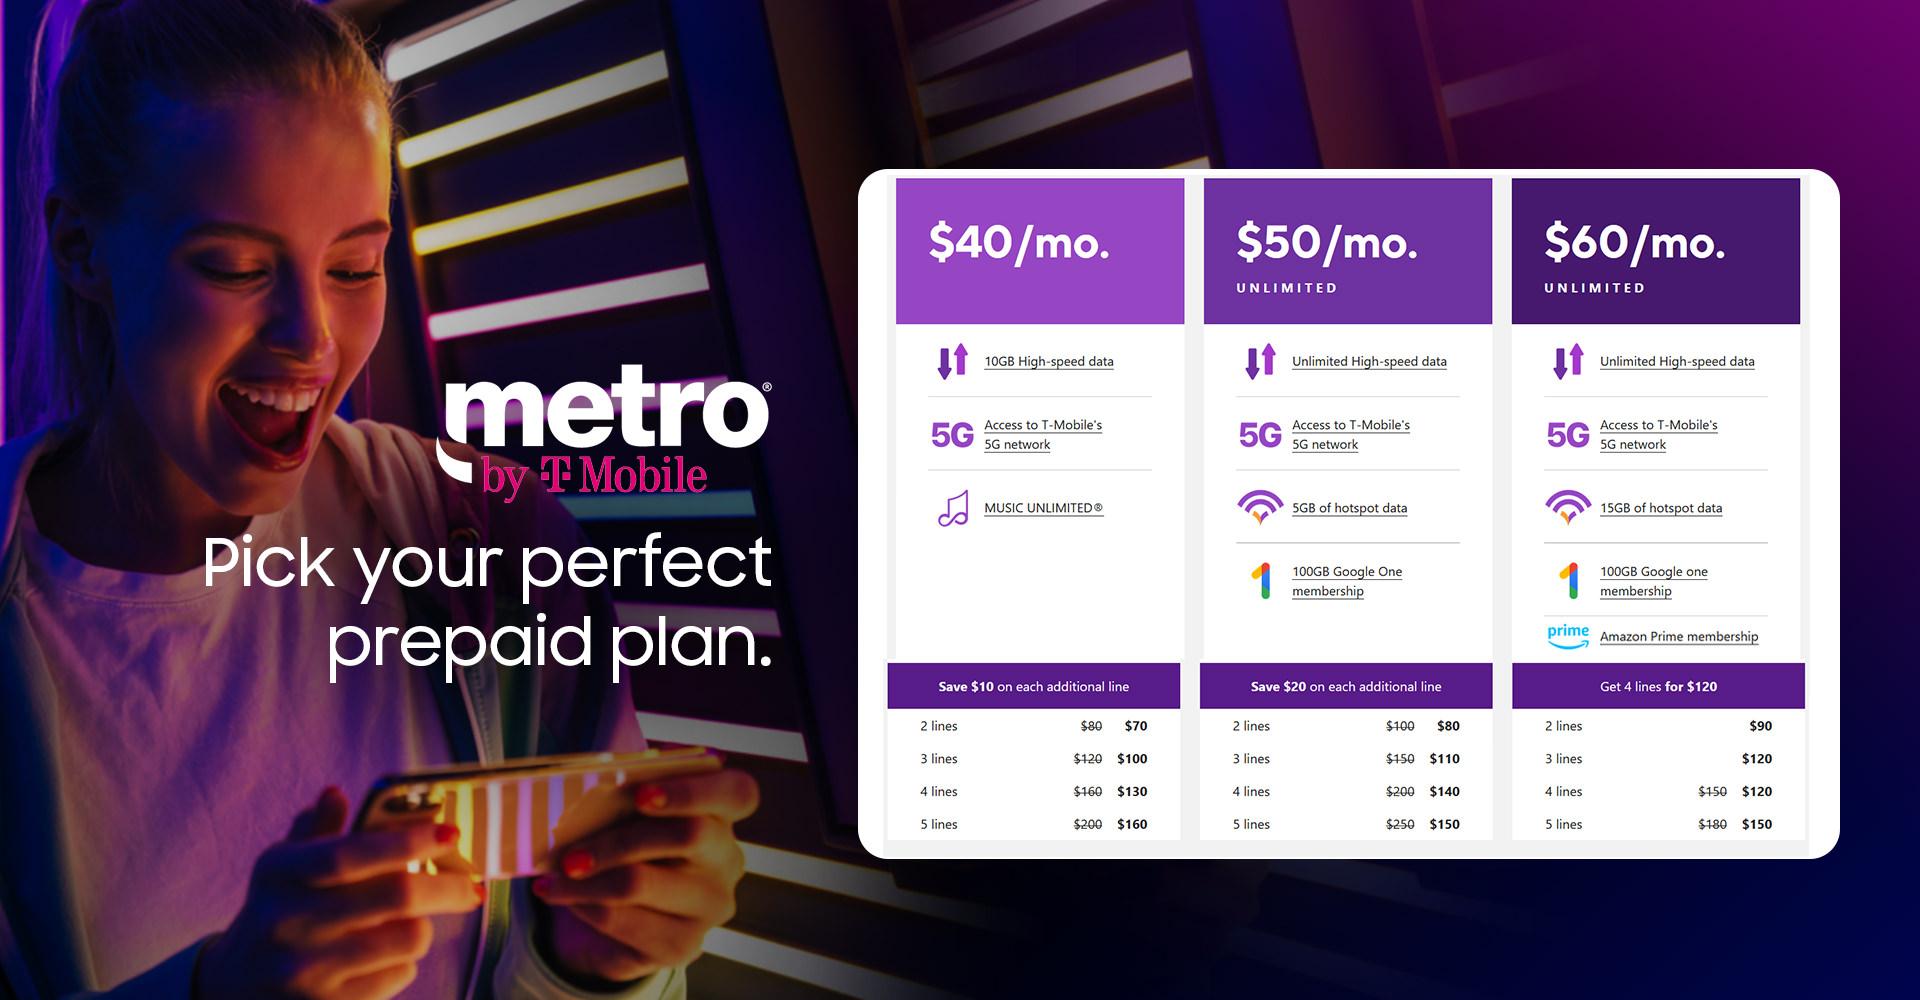 Brazcom-Wireless-Banner Plans Plans By T-Mobile